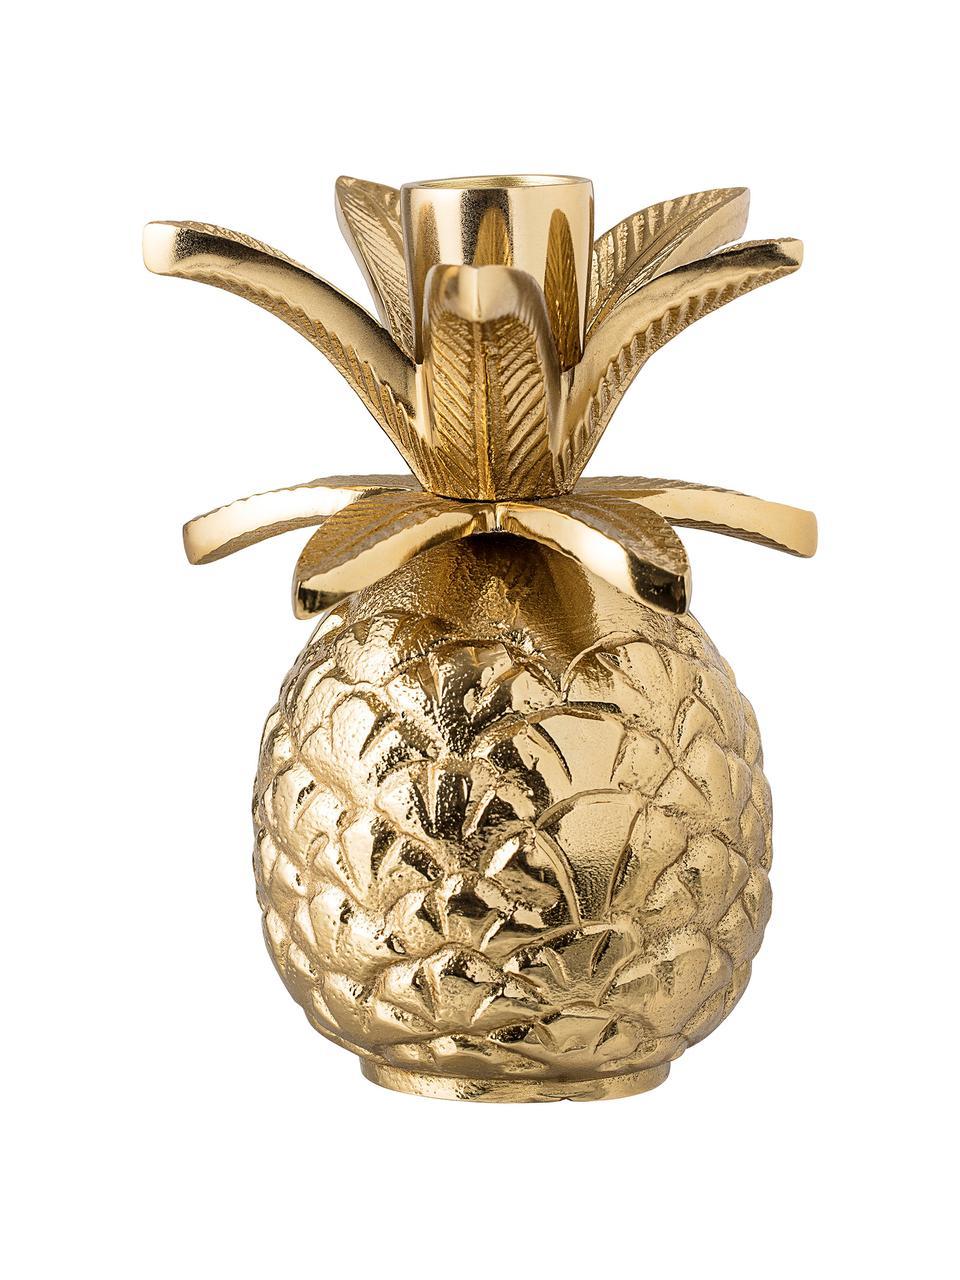 Kerzenhalter Pineapple, Aluminium, lackiert, Goldfarben, Ø 10 x H 14 cm